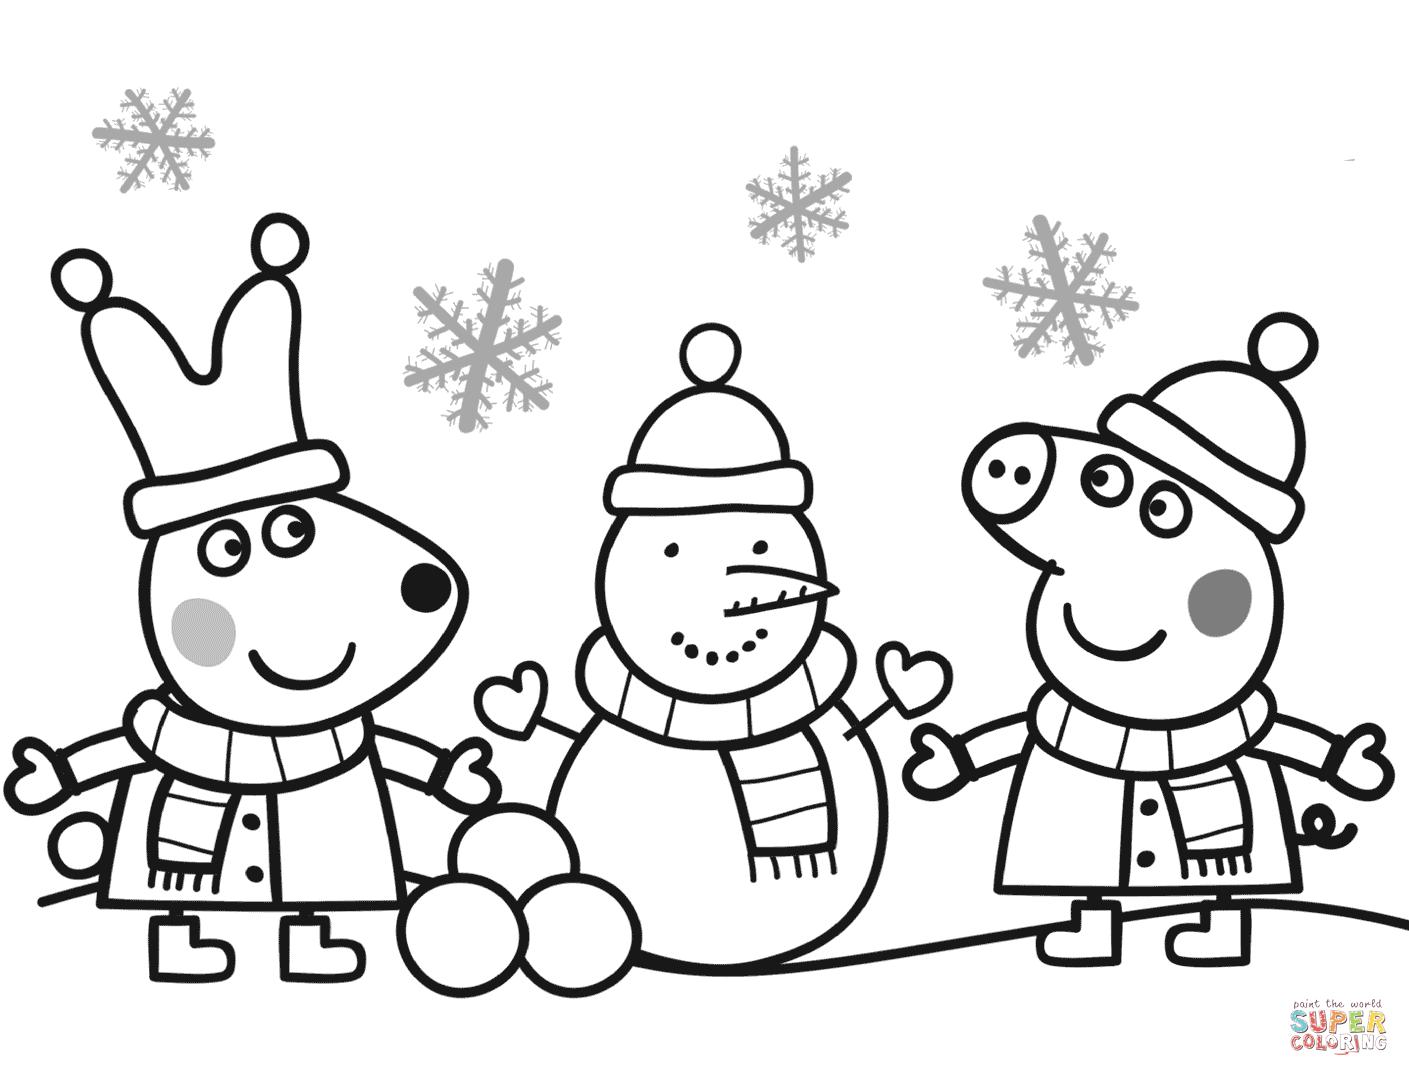 1409x1076 winter snow s kids making snowman 9baa coloring pages printable - Free Printable Coloring Pages Winter